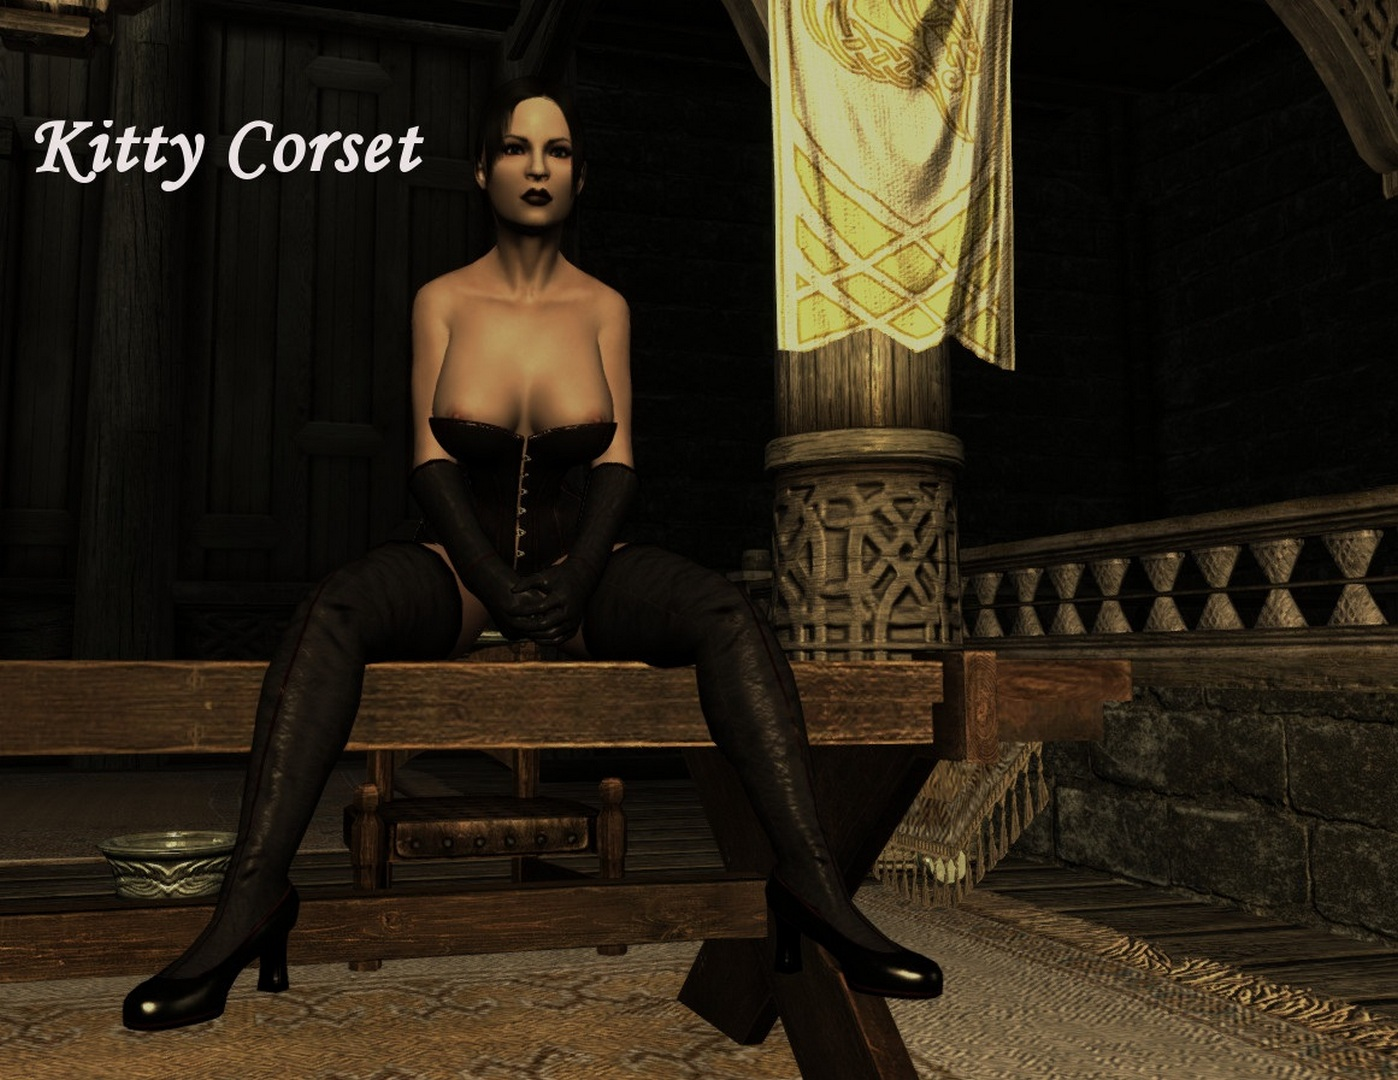 Kitty_Corset_Light_Armor.jpg